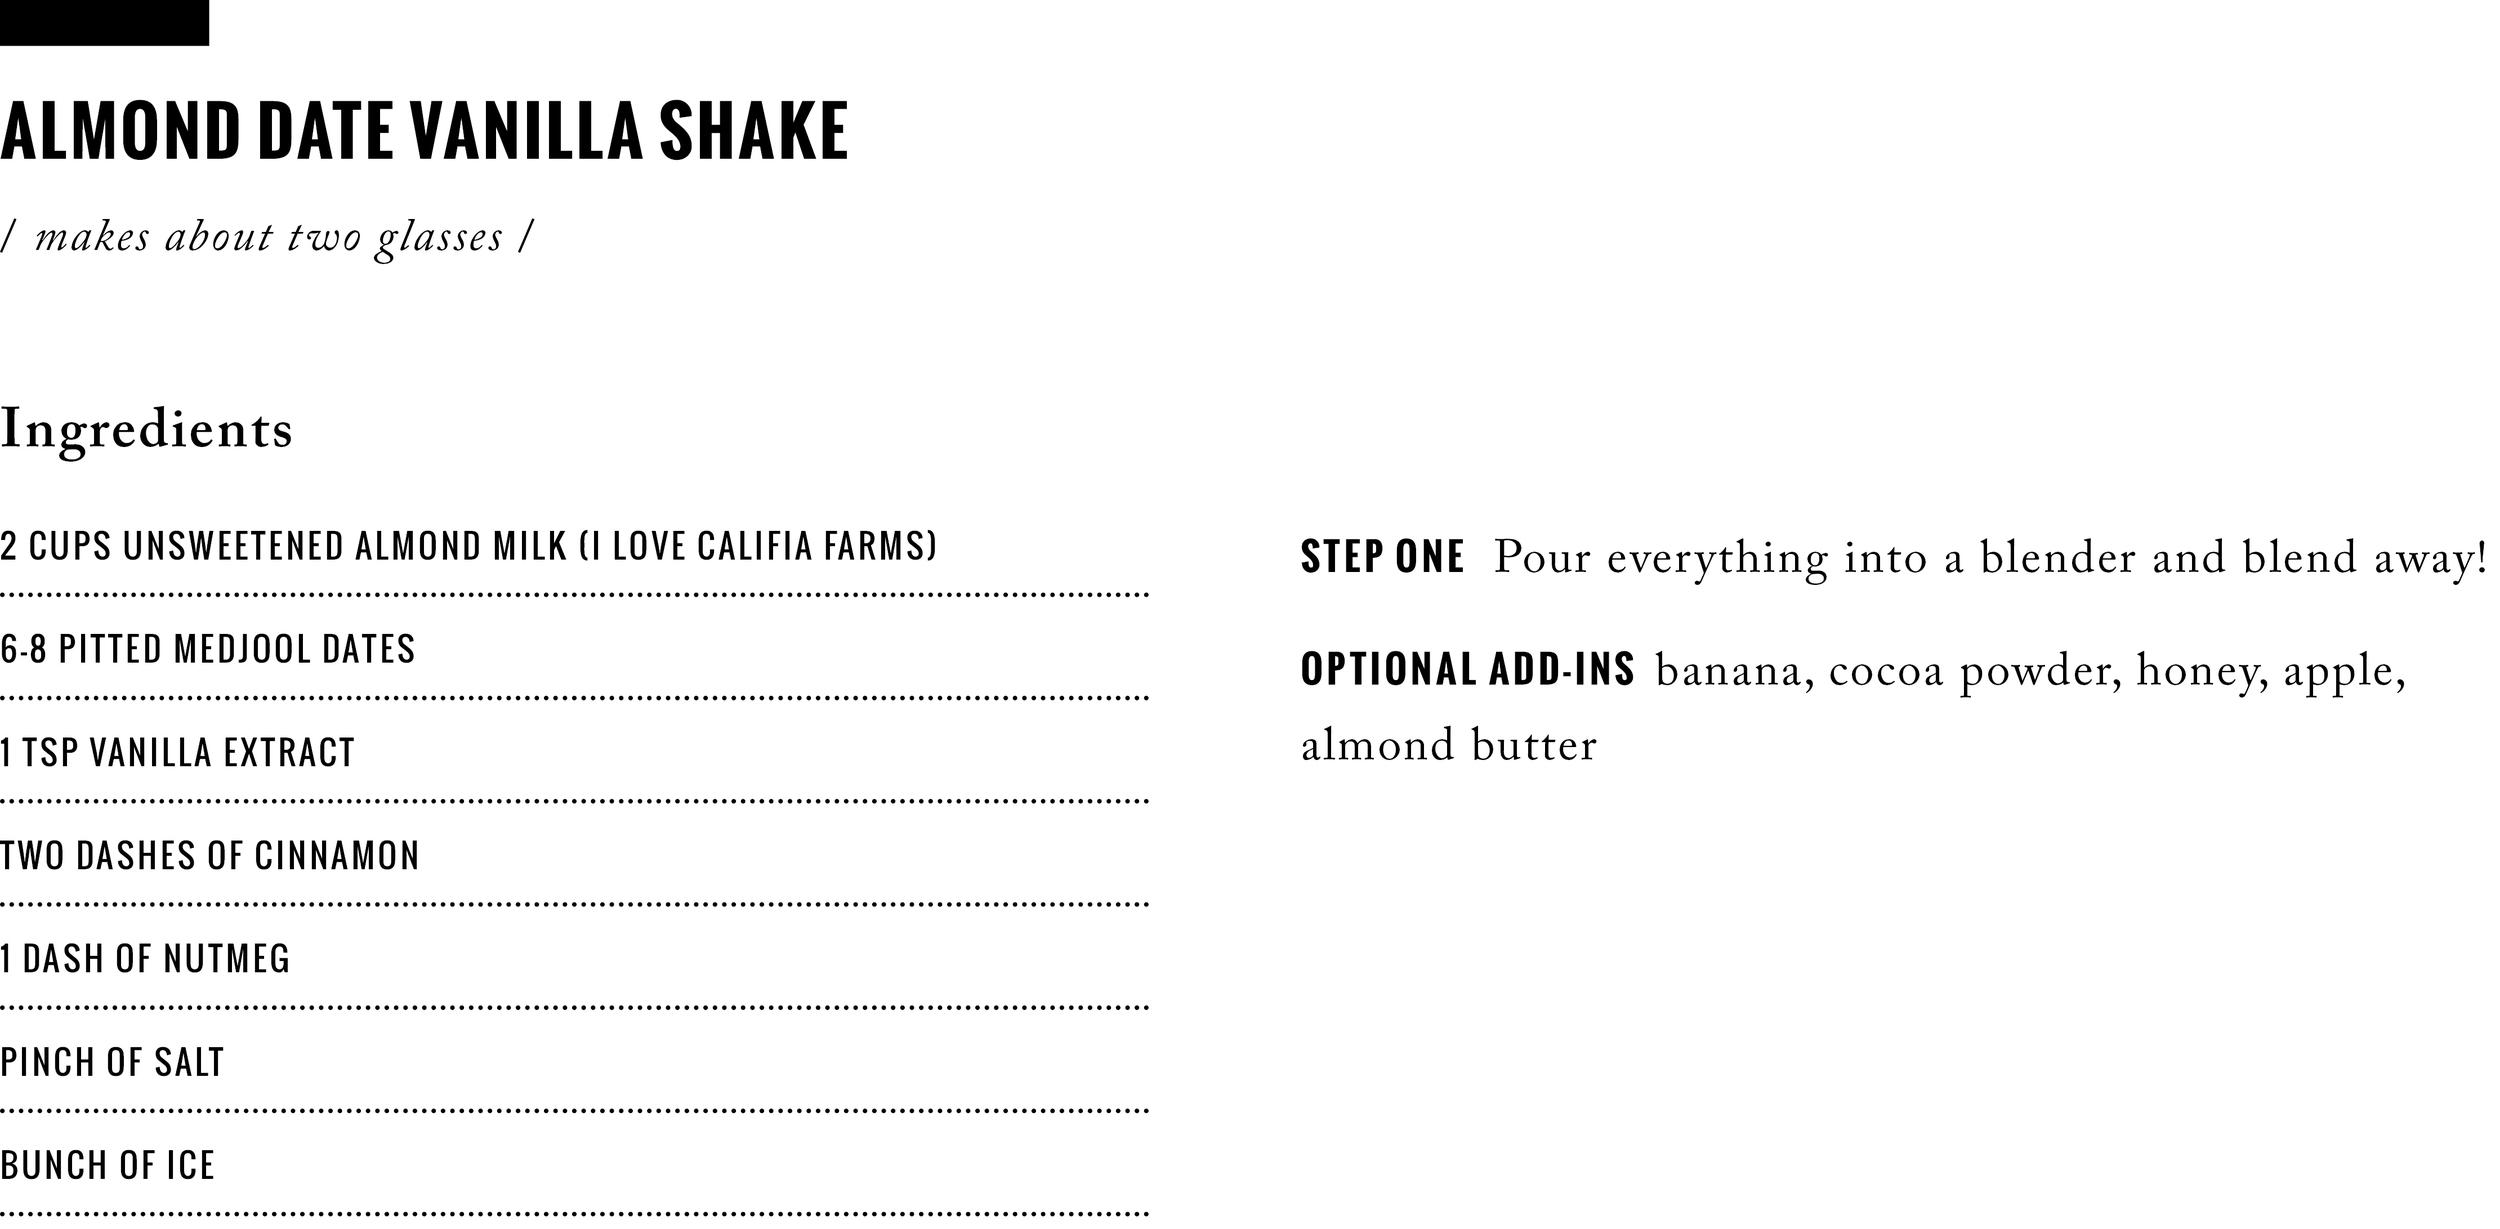 Recipe: Almond Date Vanilla Shake  /  www.goodonpaperdesign.com/blog  /  @good_on_paper